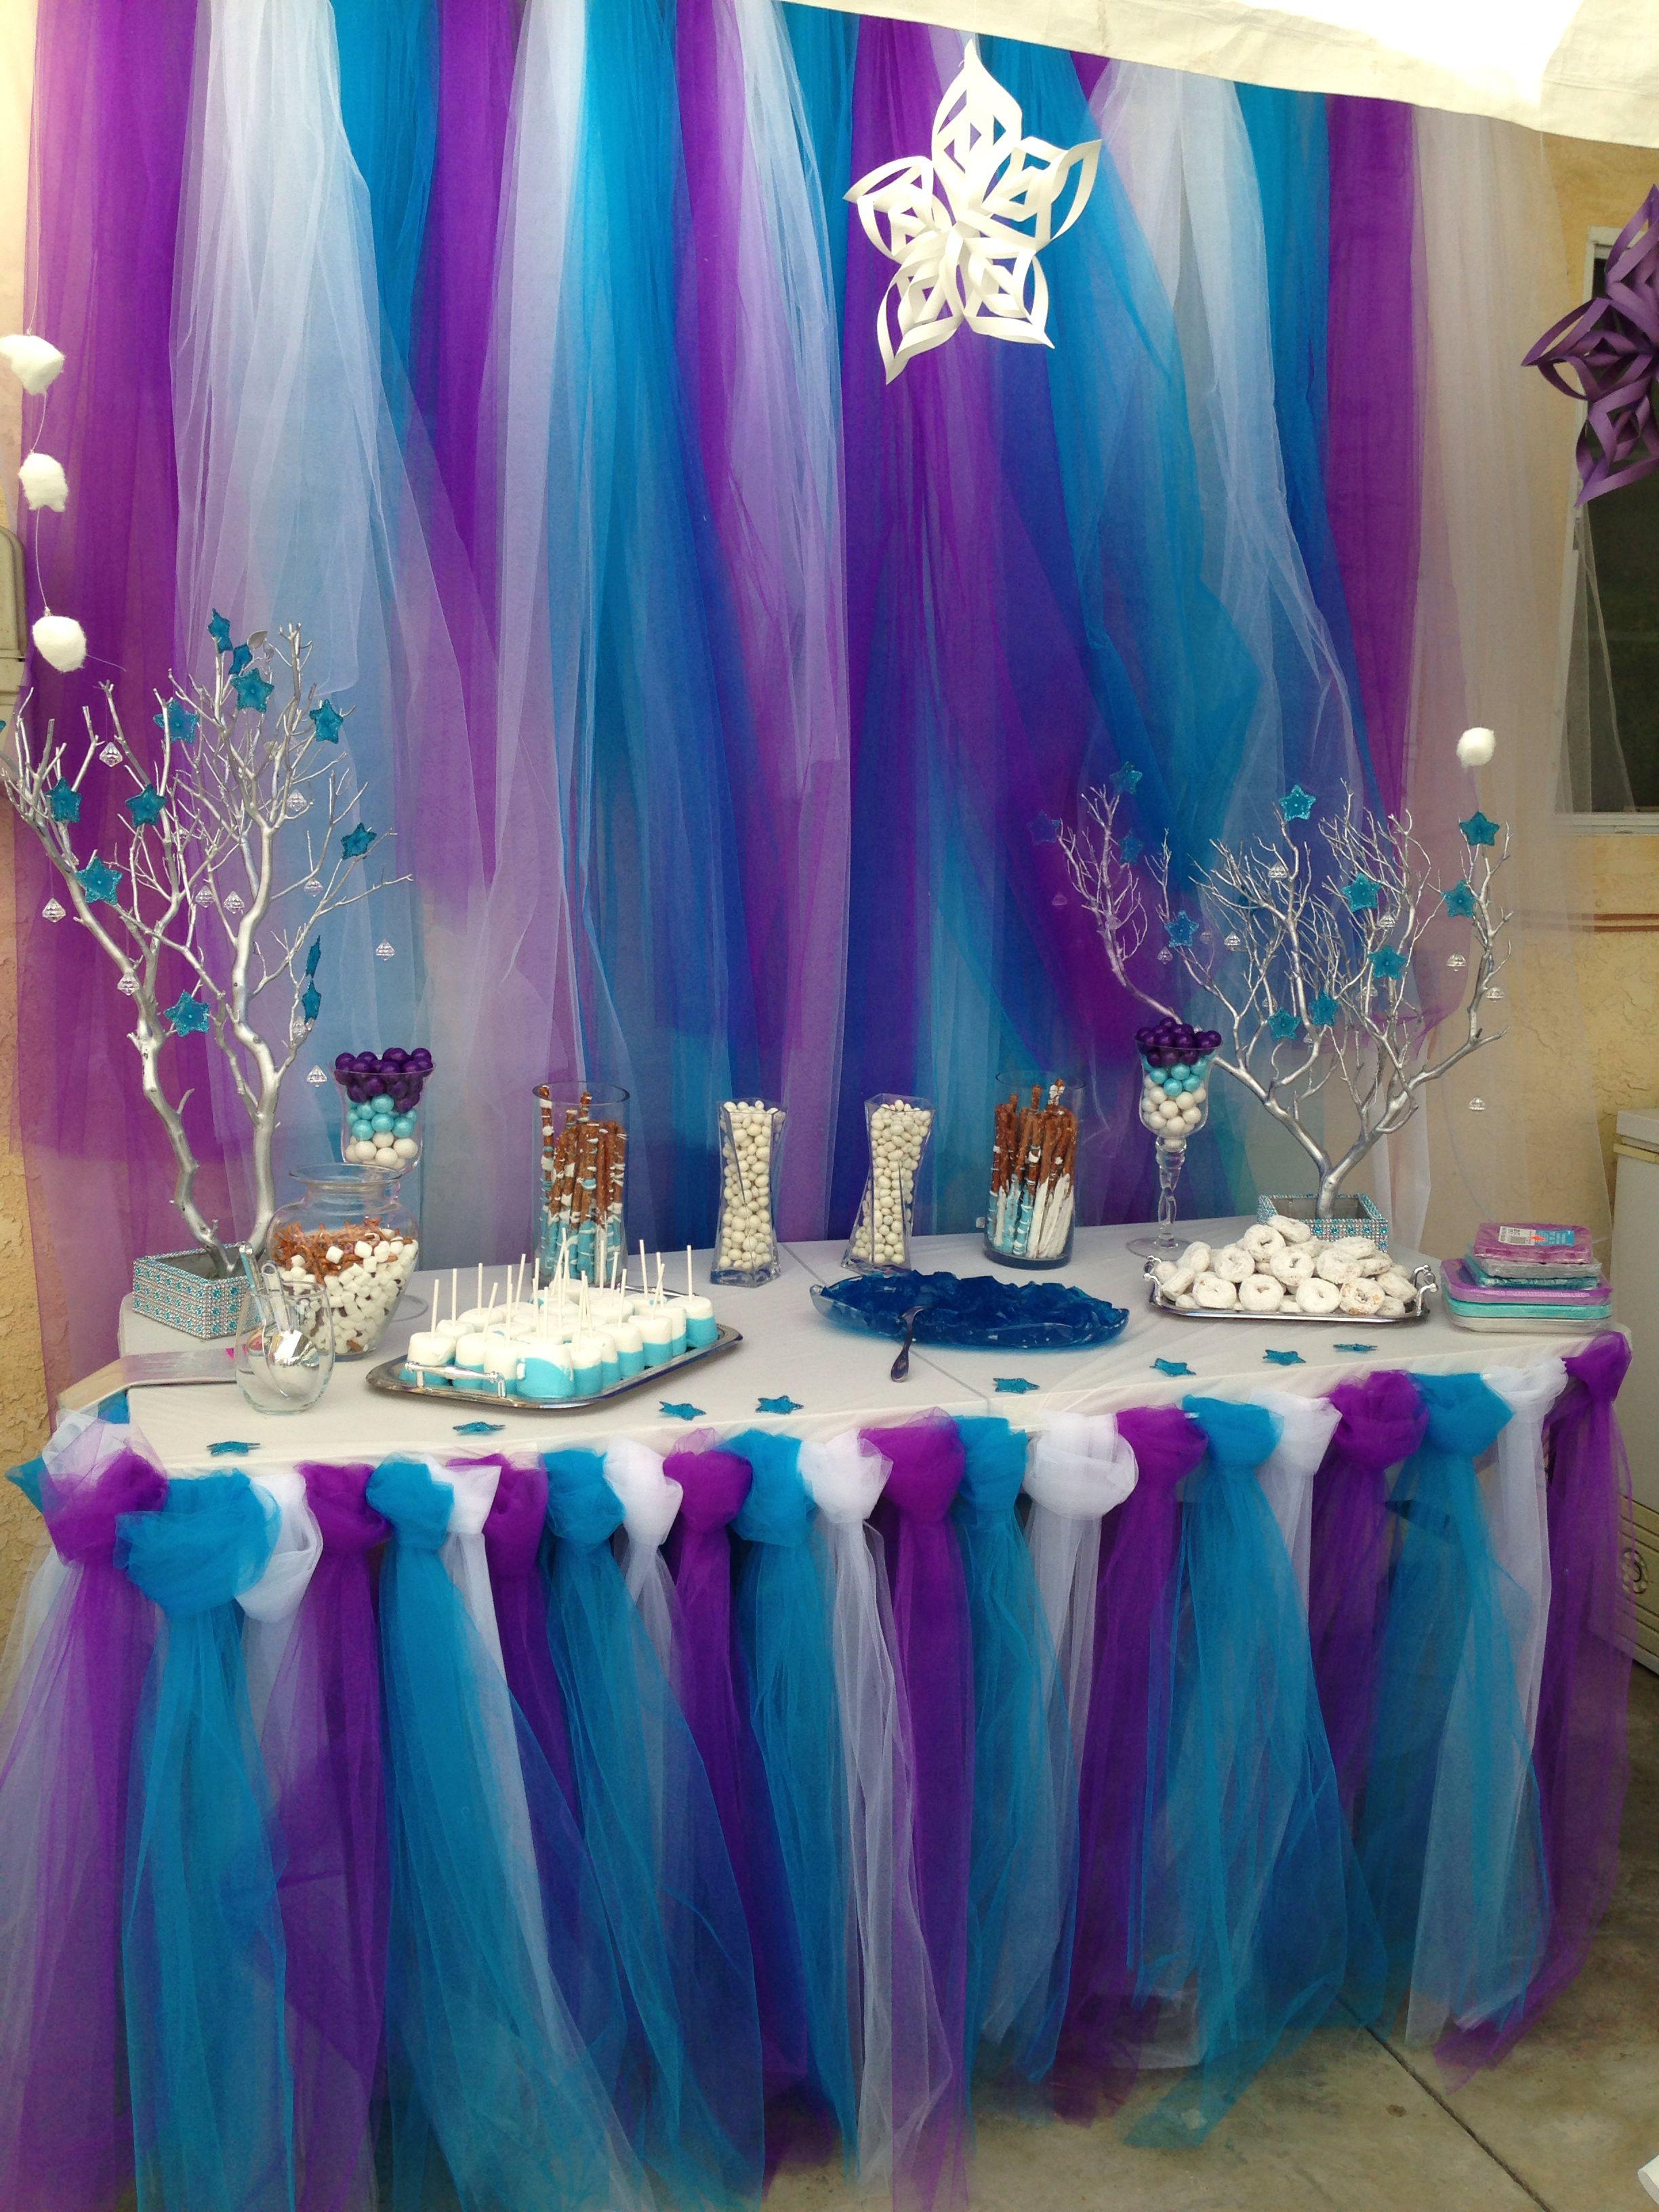 Un cumpleaños al estilo de Frozen   Frozen theme, Party candy and ...